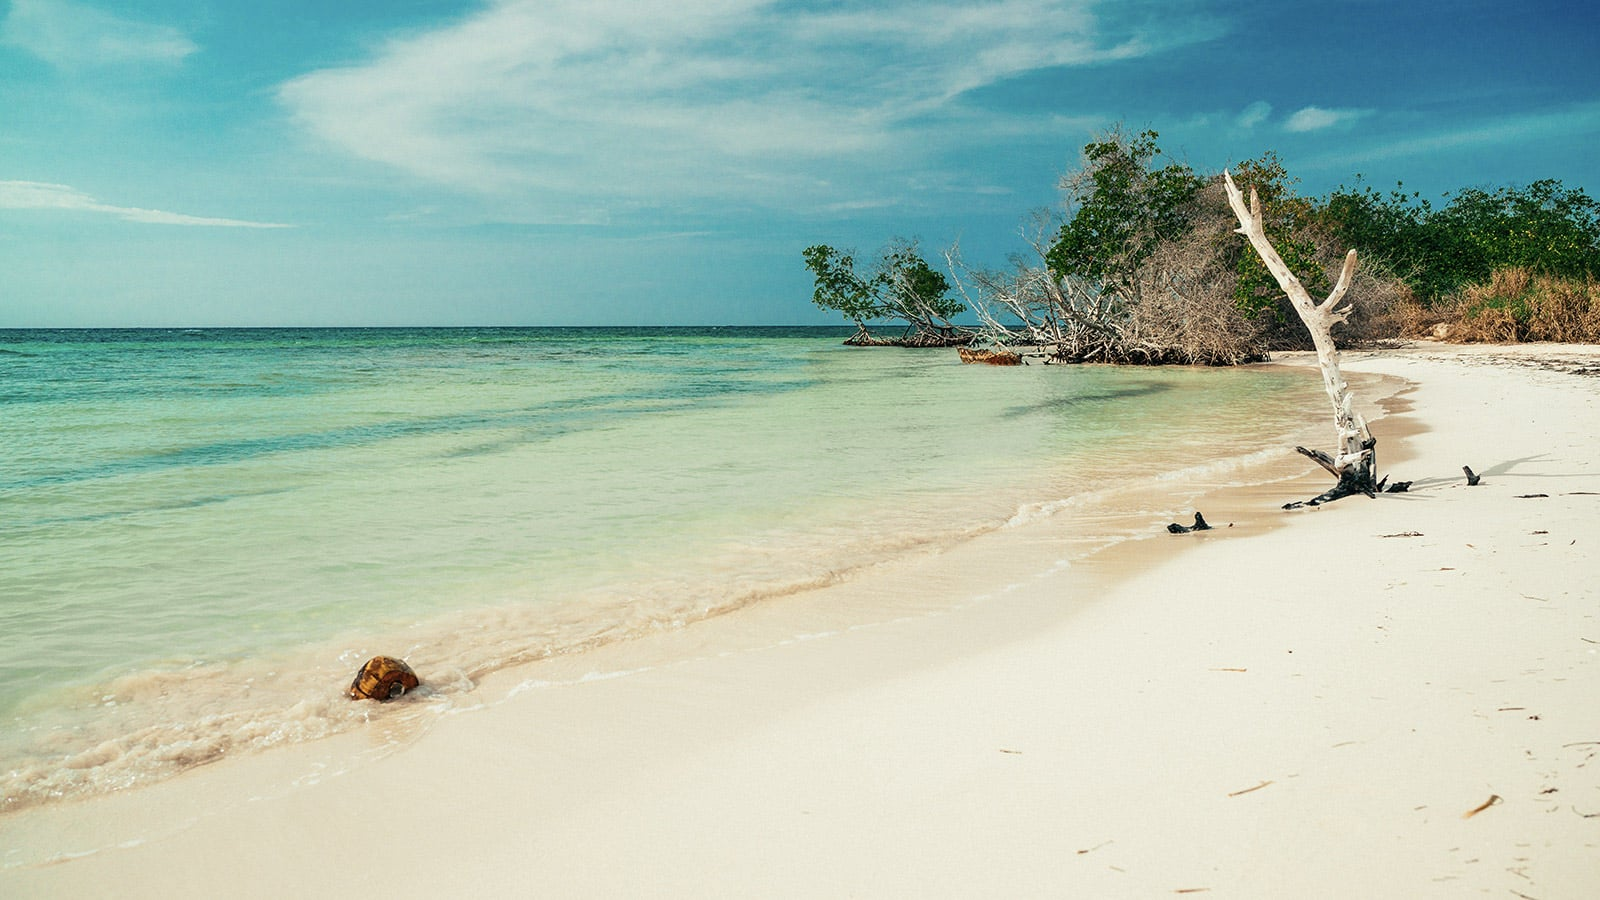 Einsamer Strand in Kuba